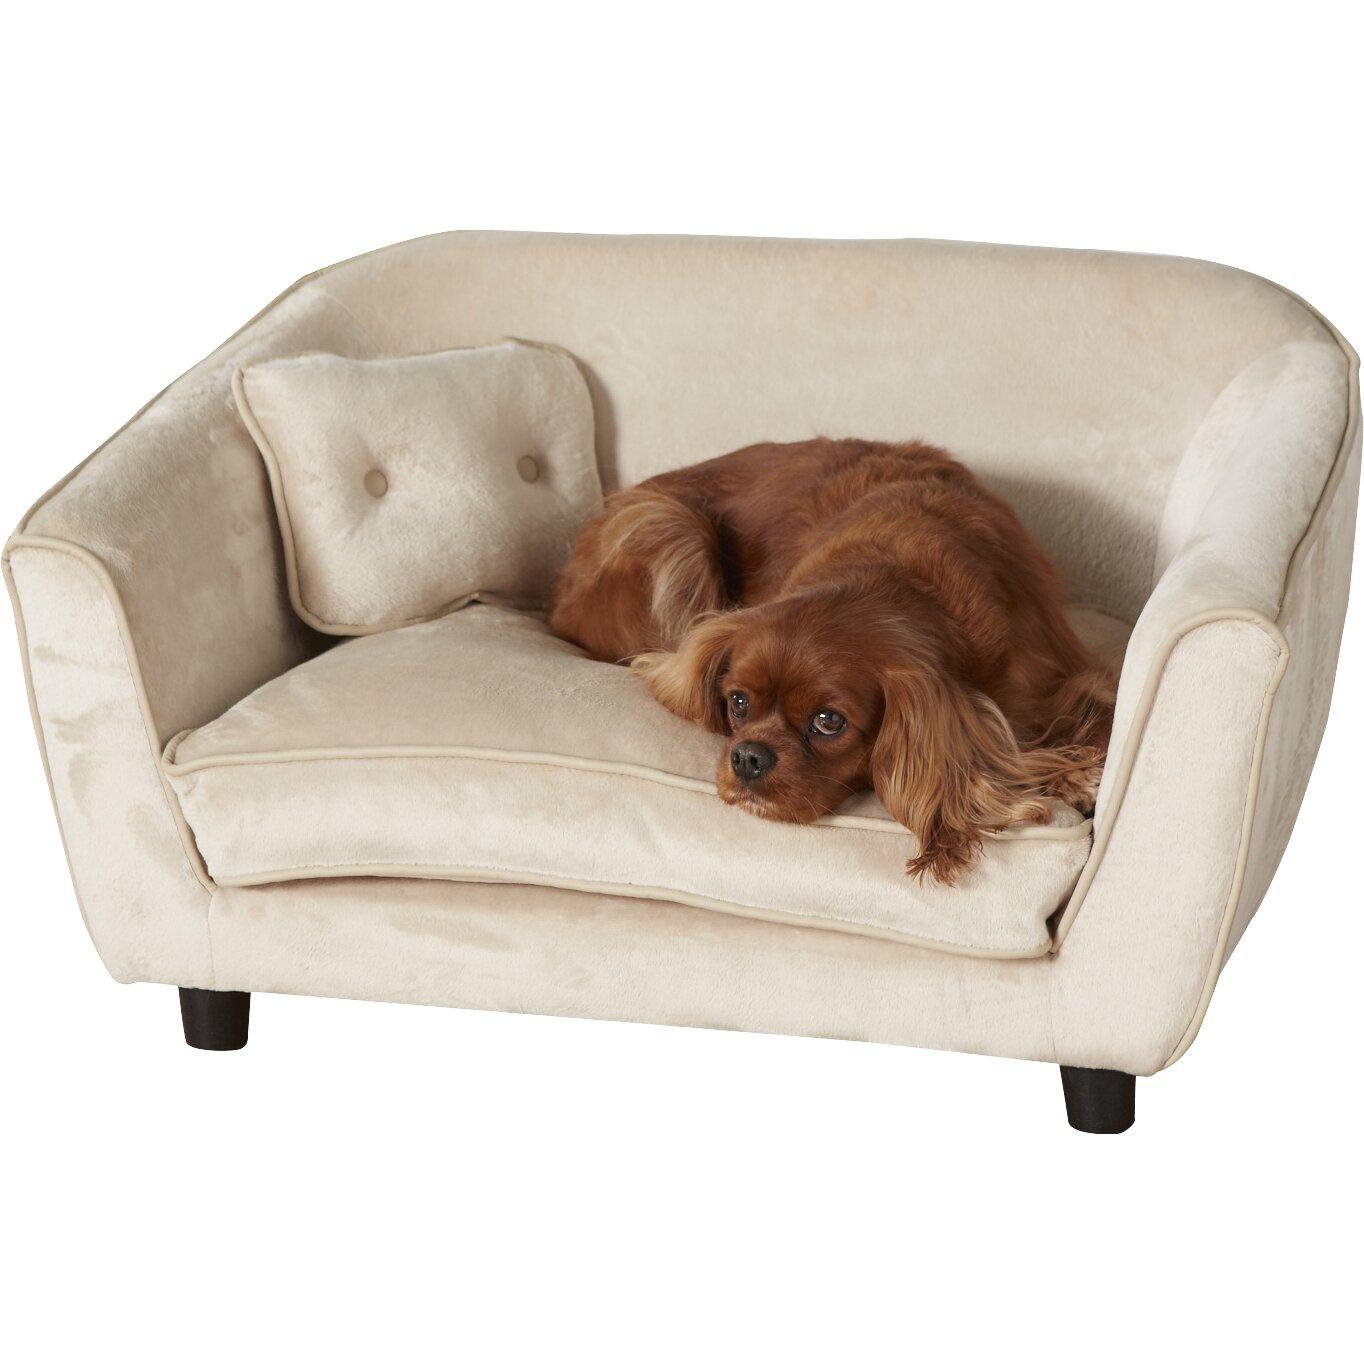 enchanted home pet ultra plush large astro dog sofa. Black Bedroom Furniture Sets. Home Design Ideas